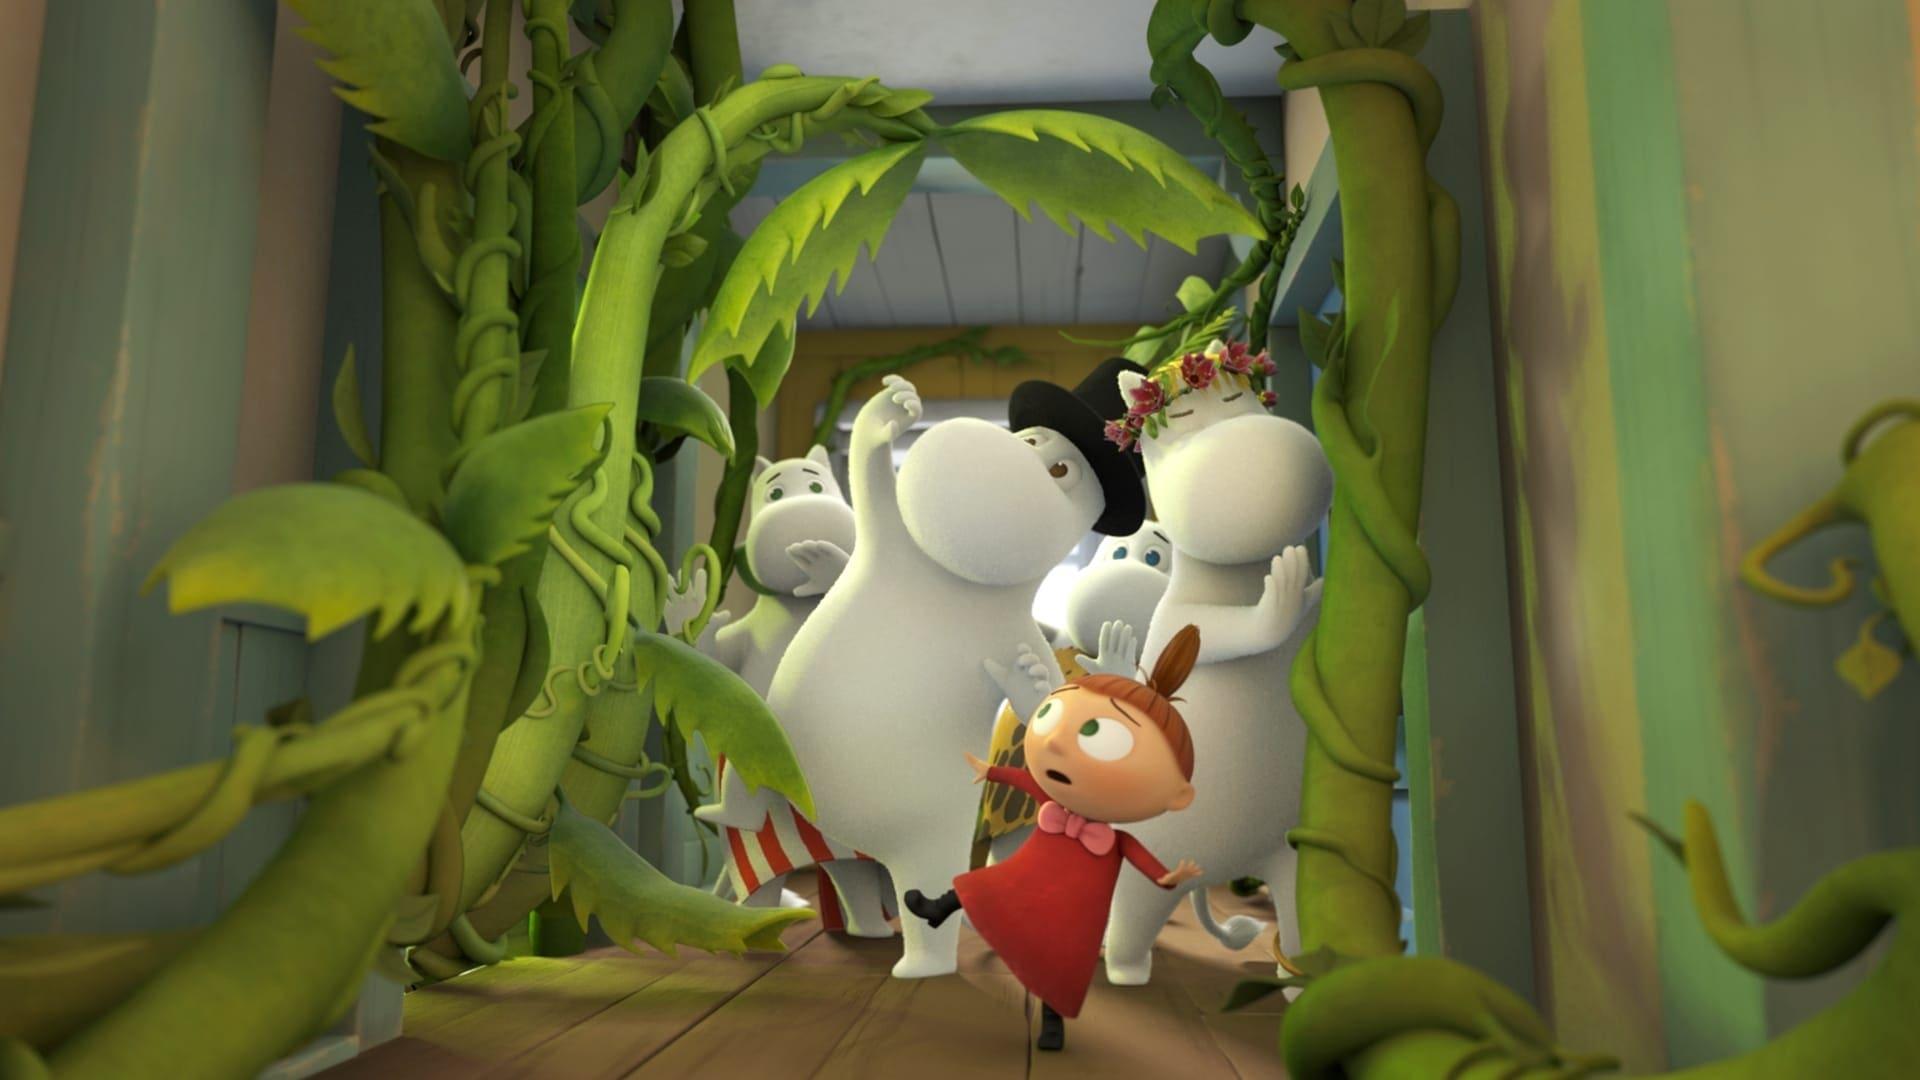 Moominvalley: Season 1 Episode 8 S01E08 Watch Openload Episodes Online